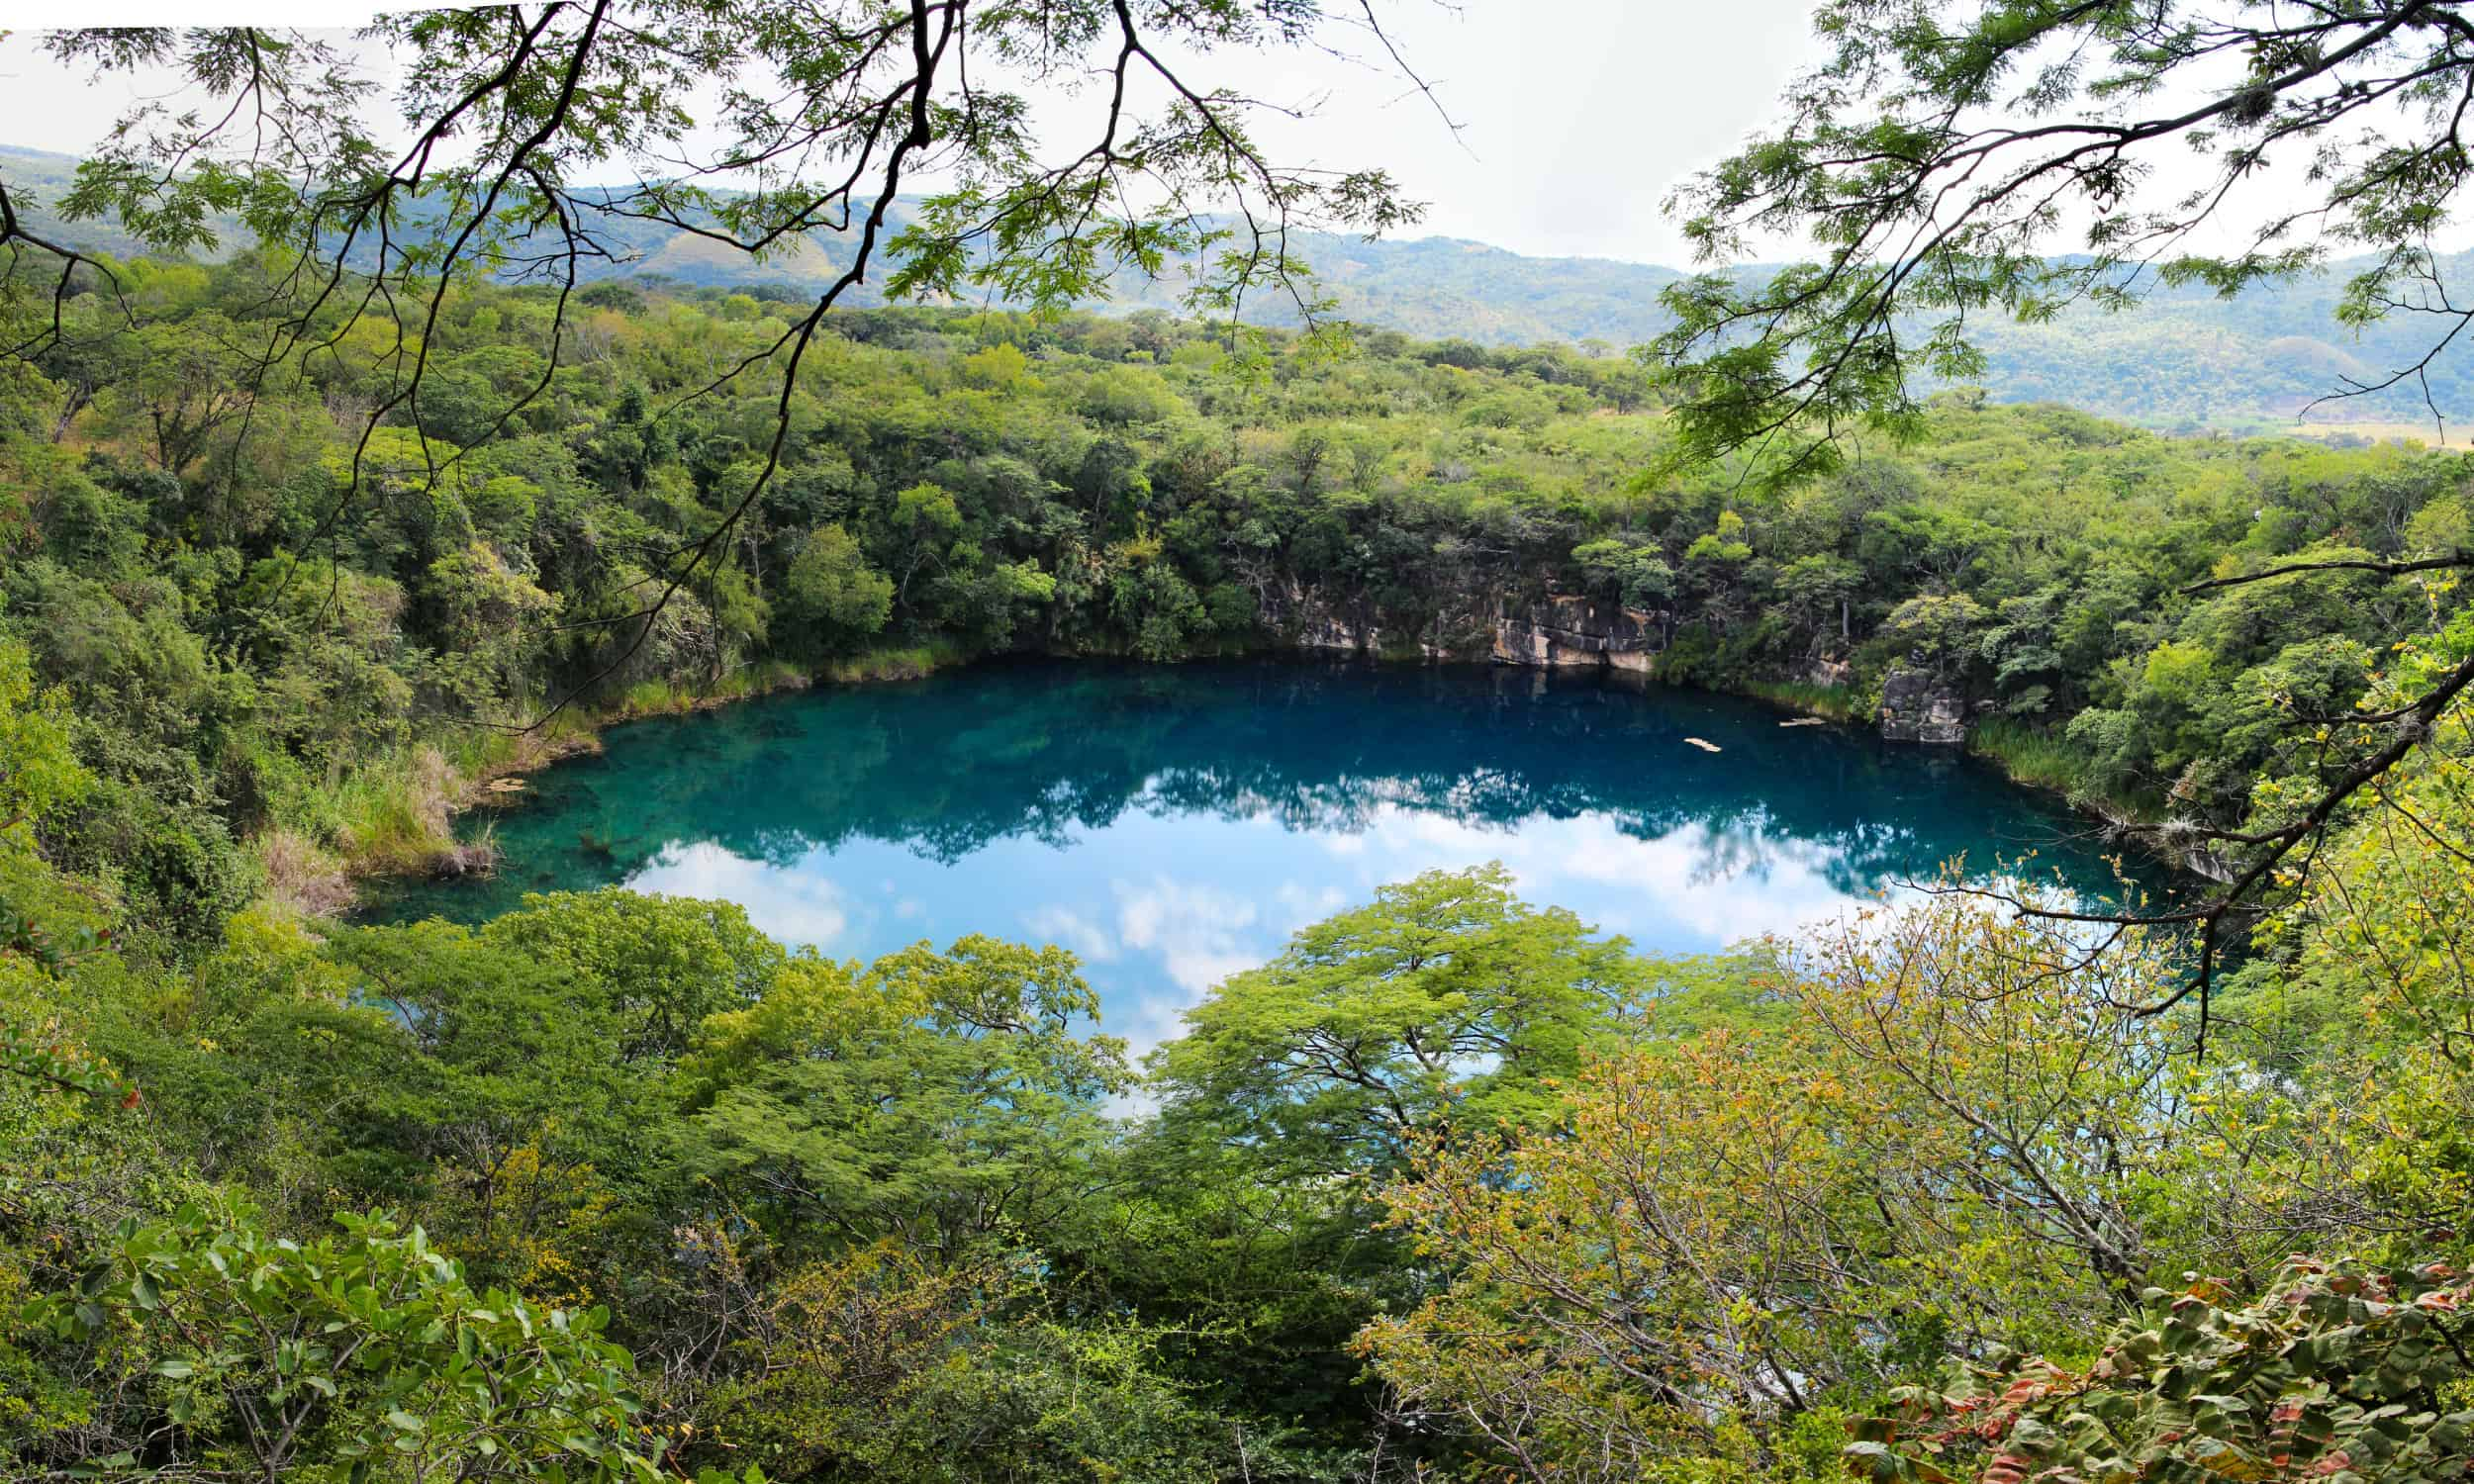 Cenote de Candelaria 1 - Panorama